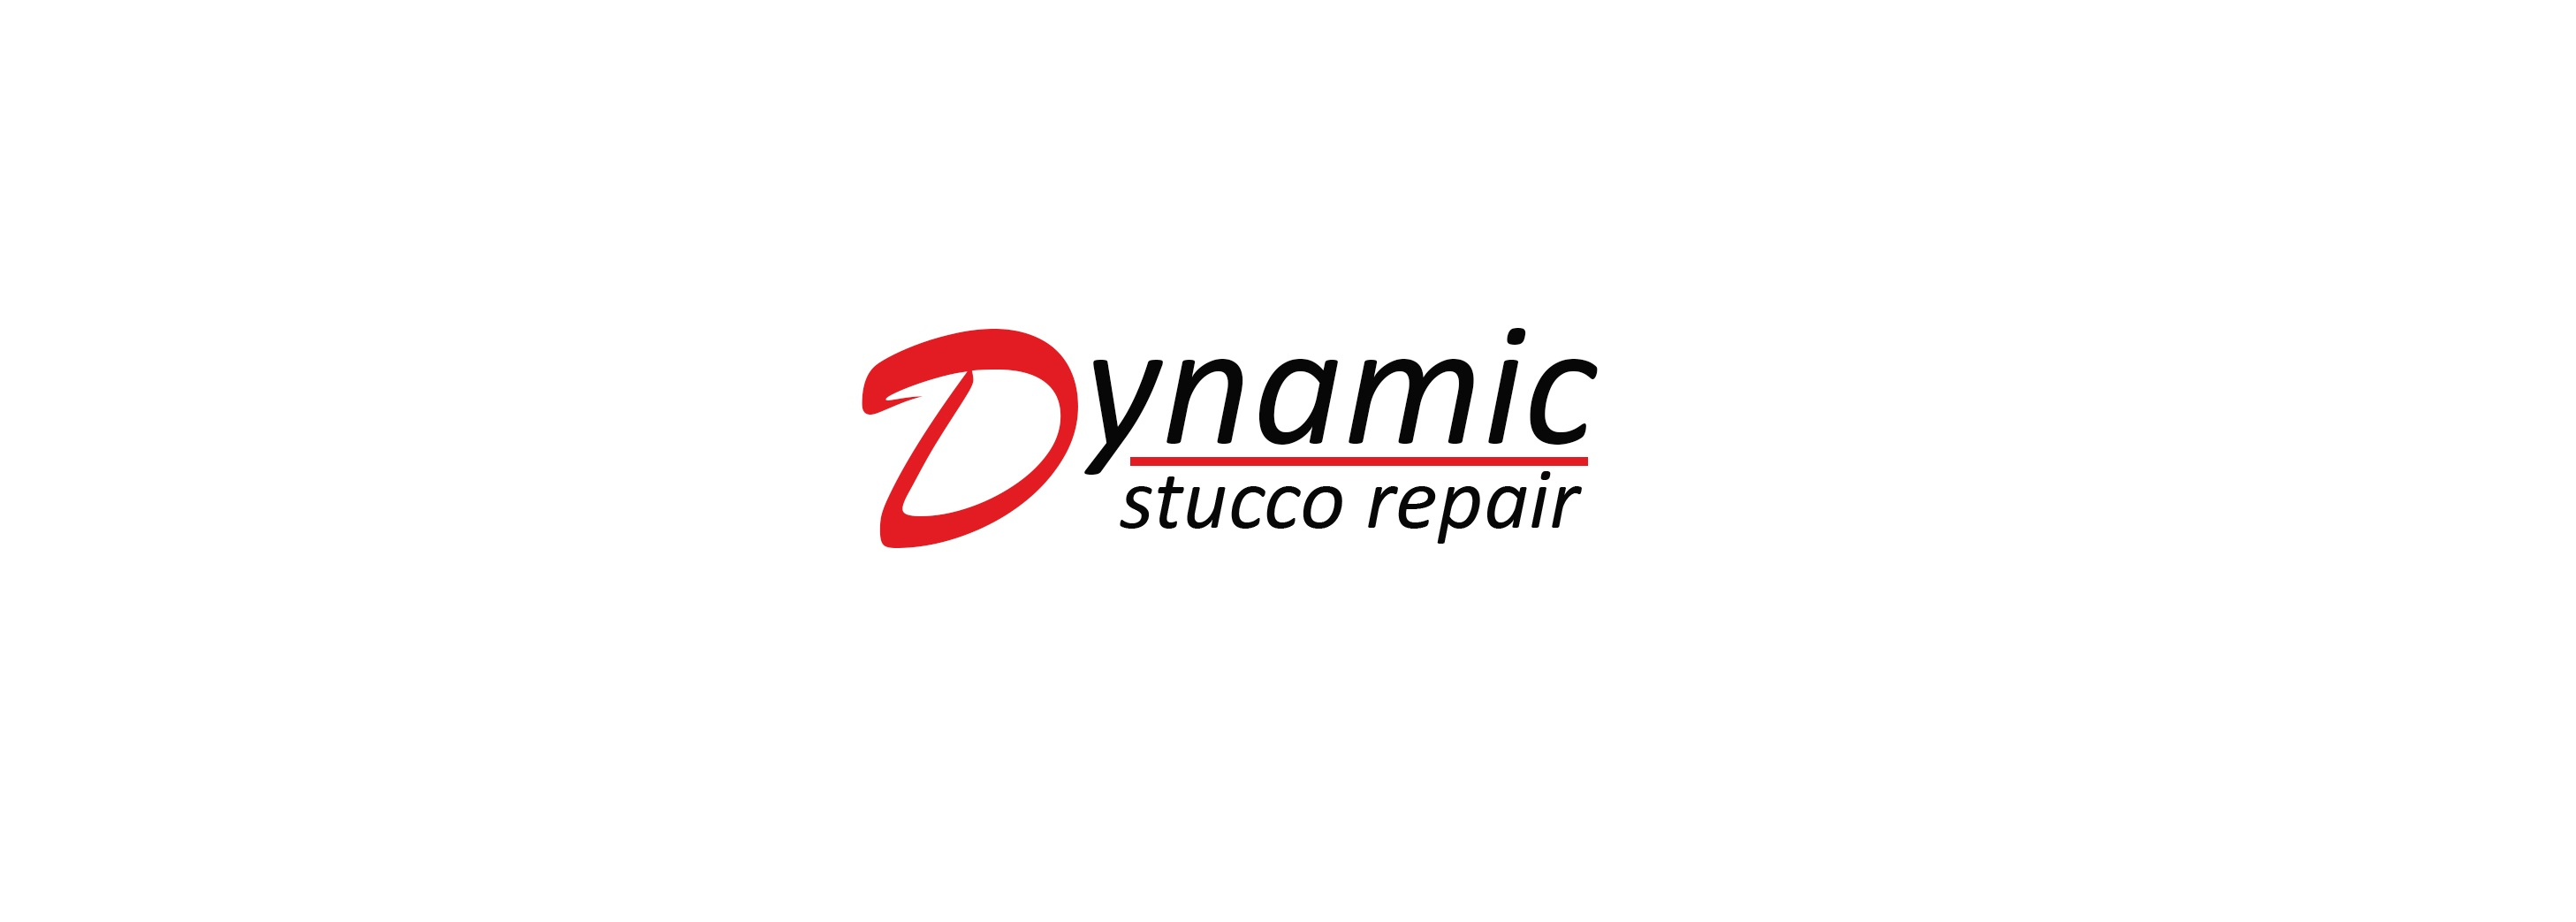 dynamic logo1.jpg